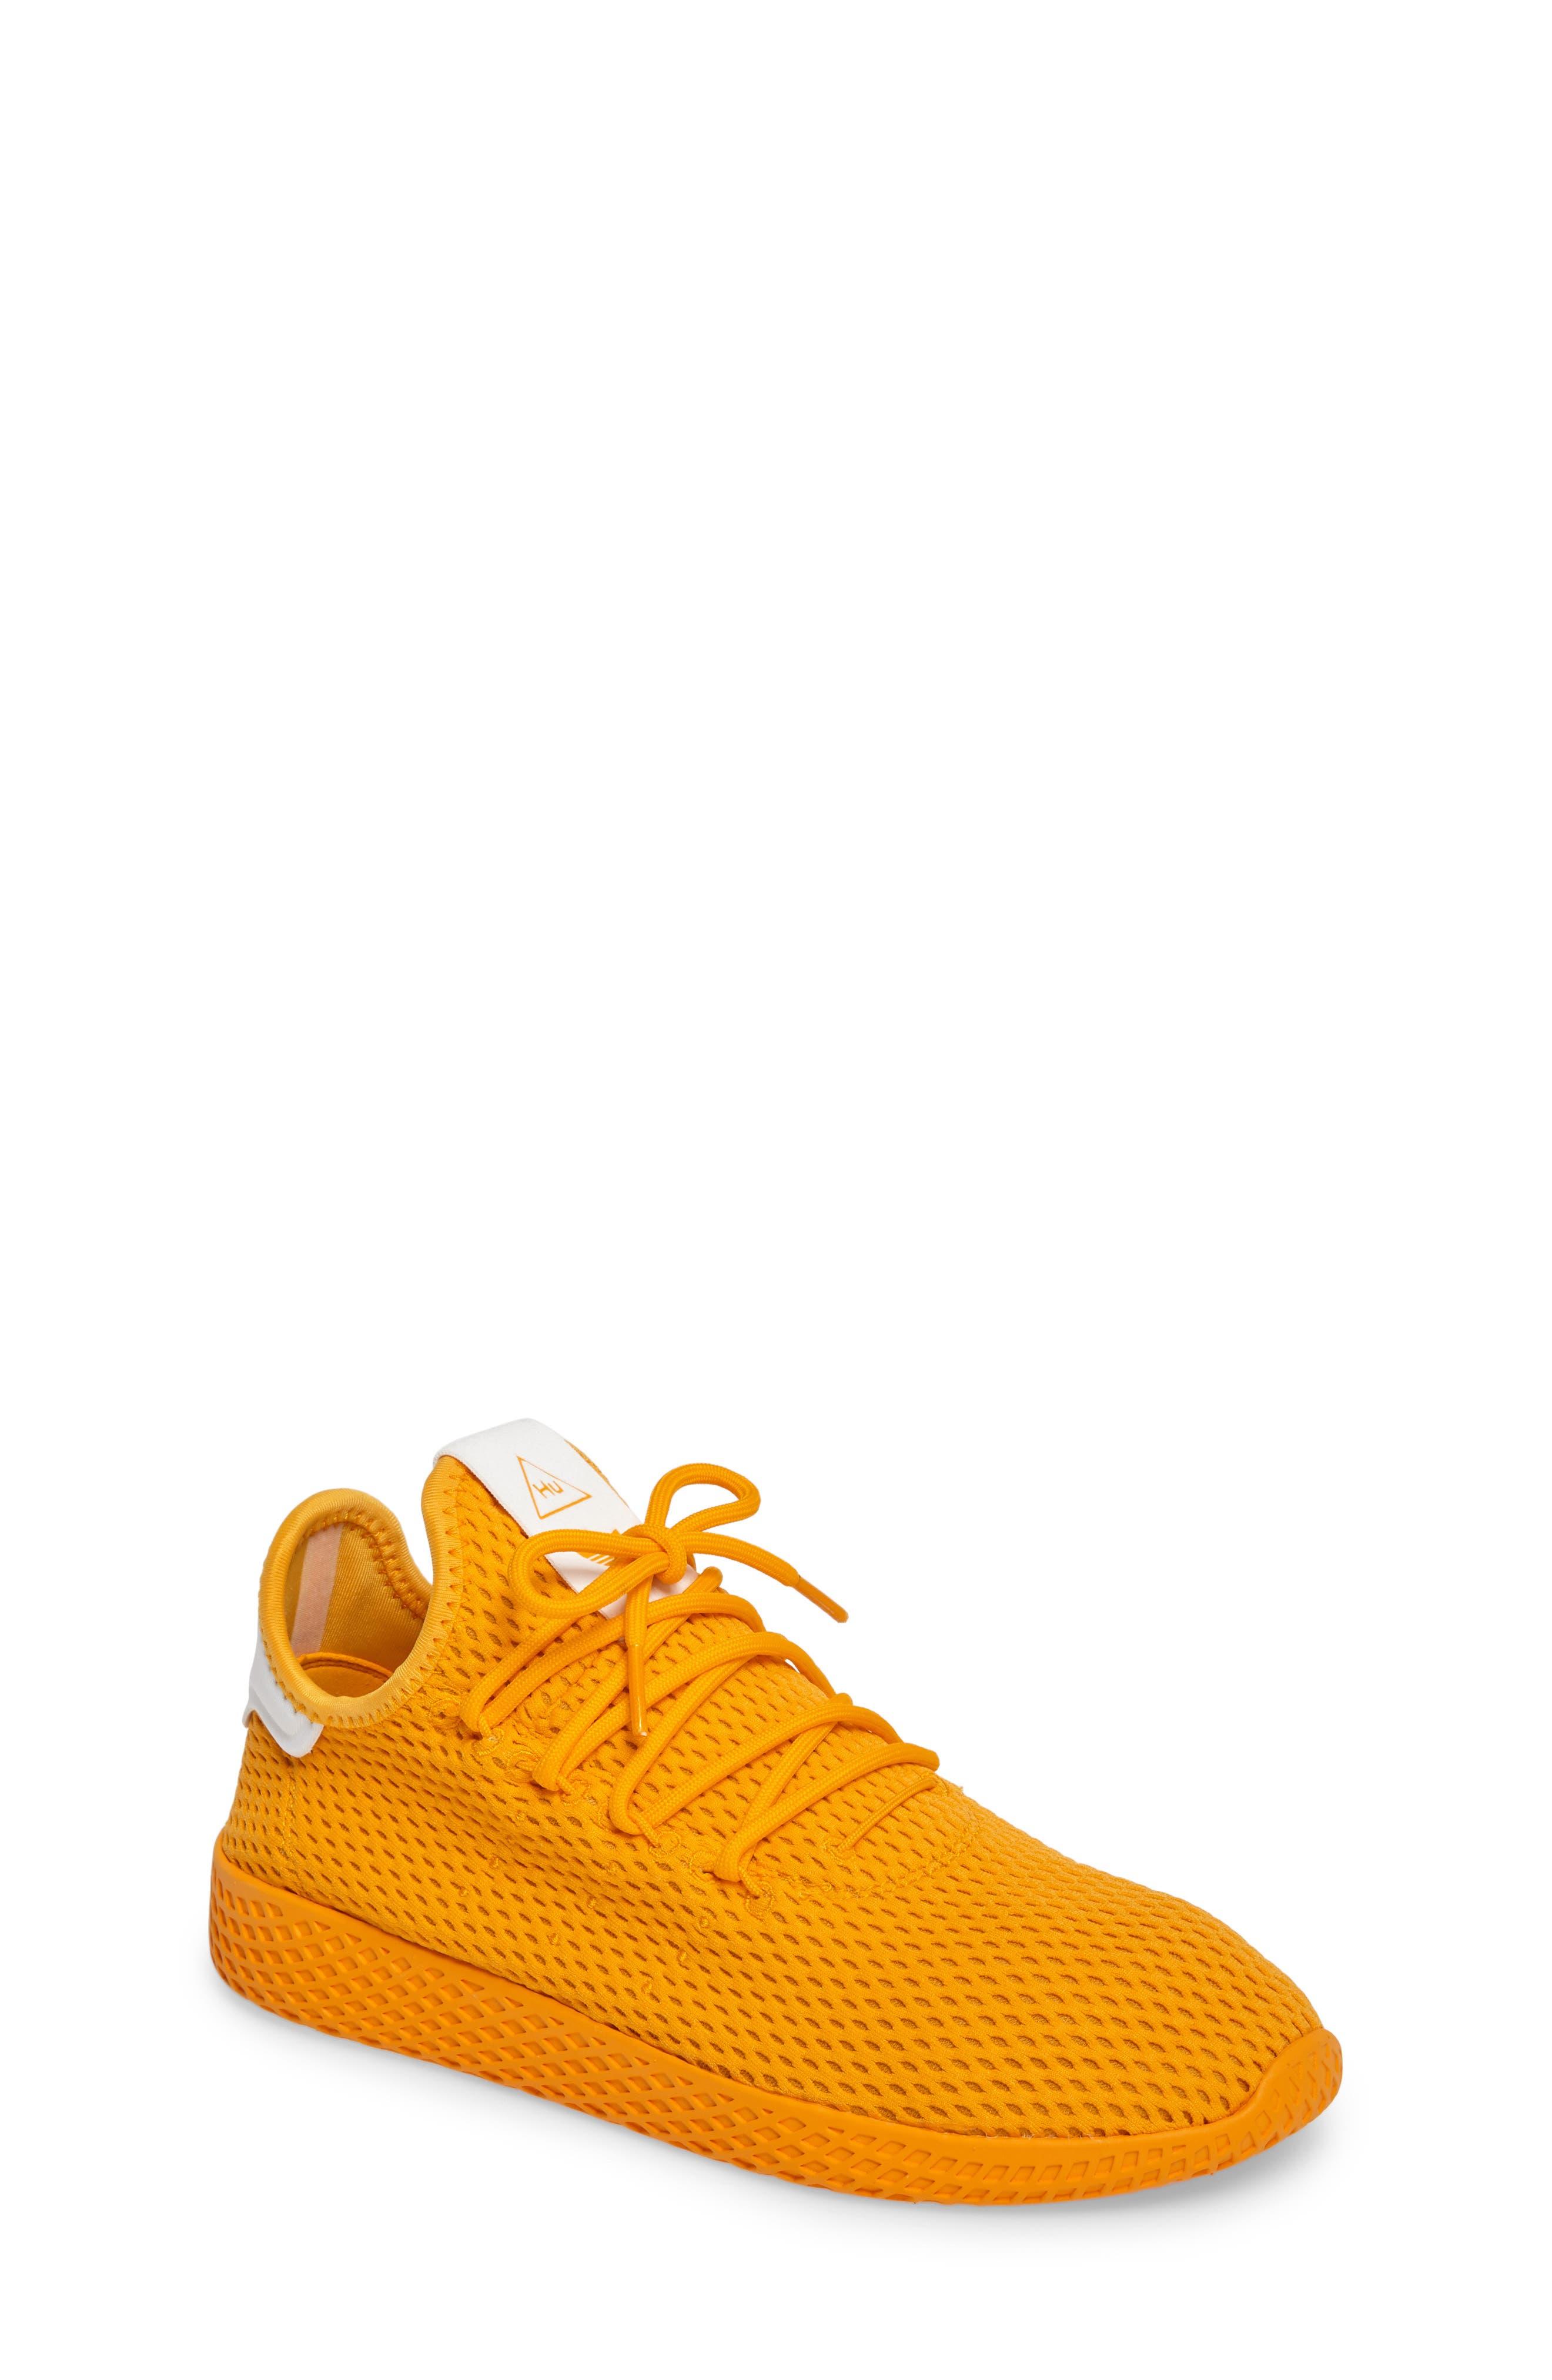 Alternate Image 1 Selected - adidas Originals x Pharrell Williams The Summers Mesh Sneaker (Big Kid)